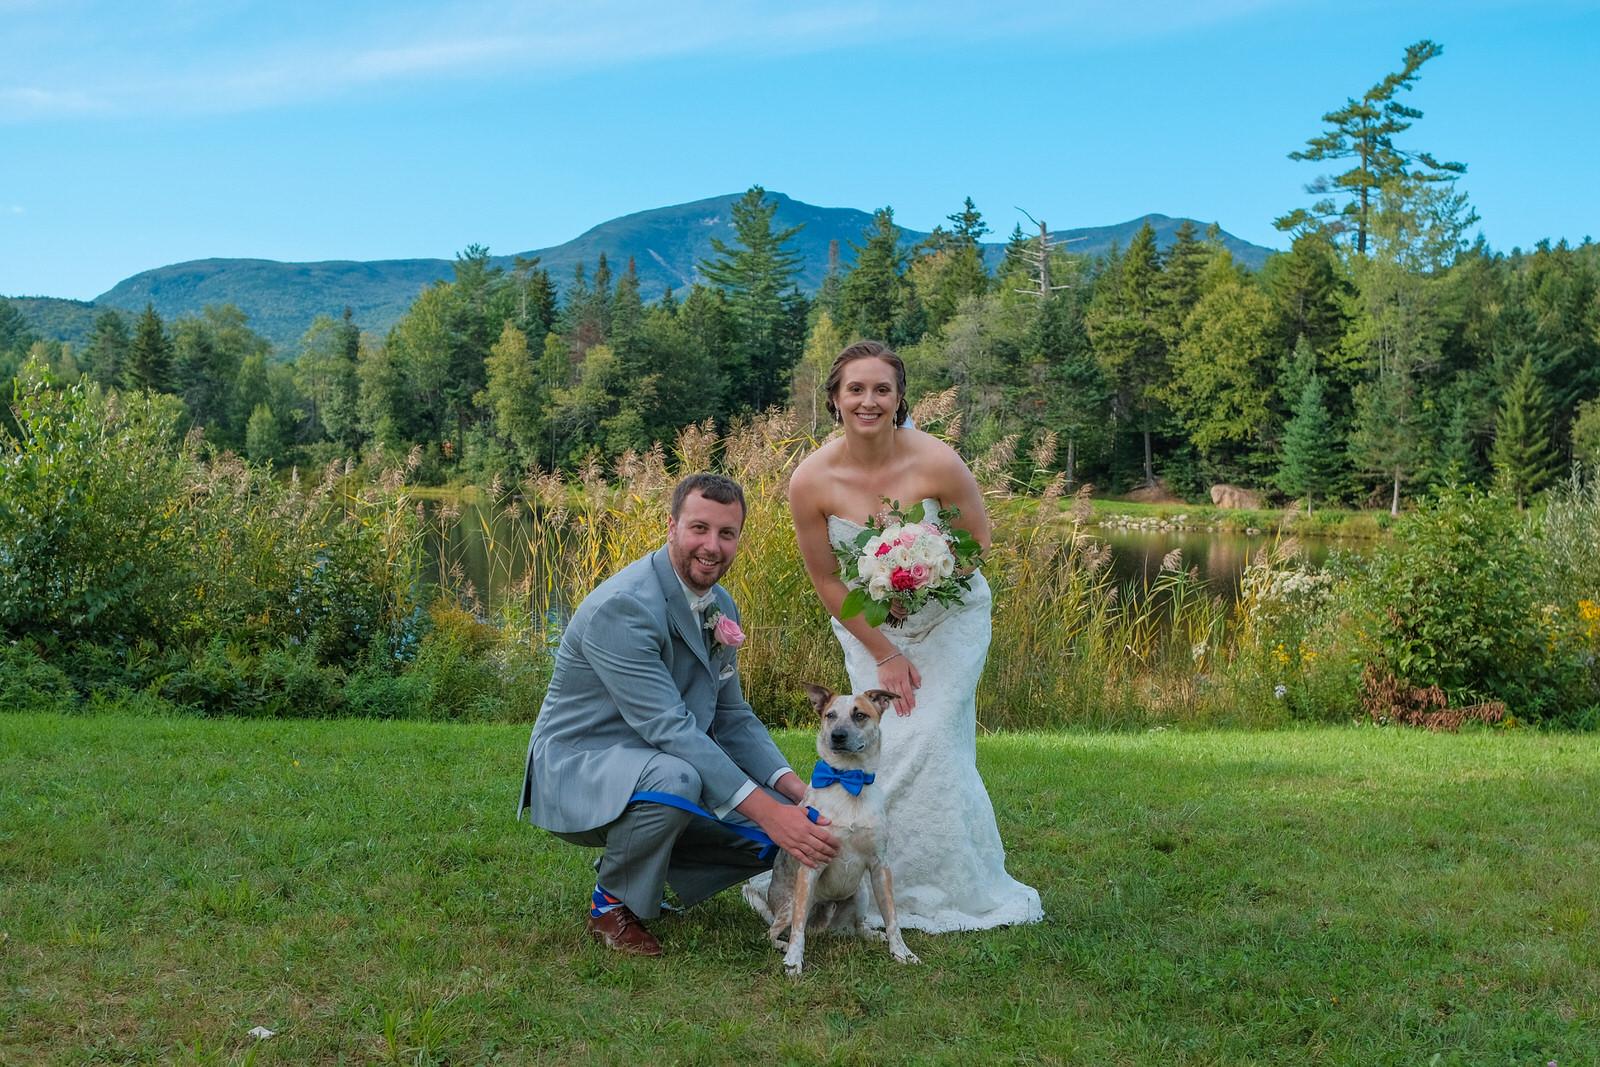 waterville-valley-wedding-photography-758.jpg